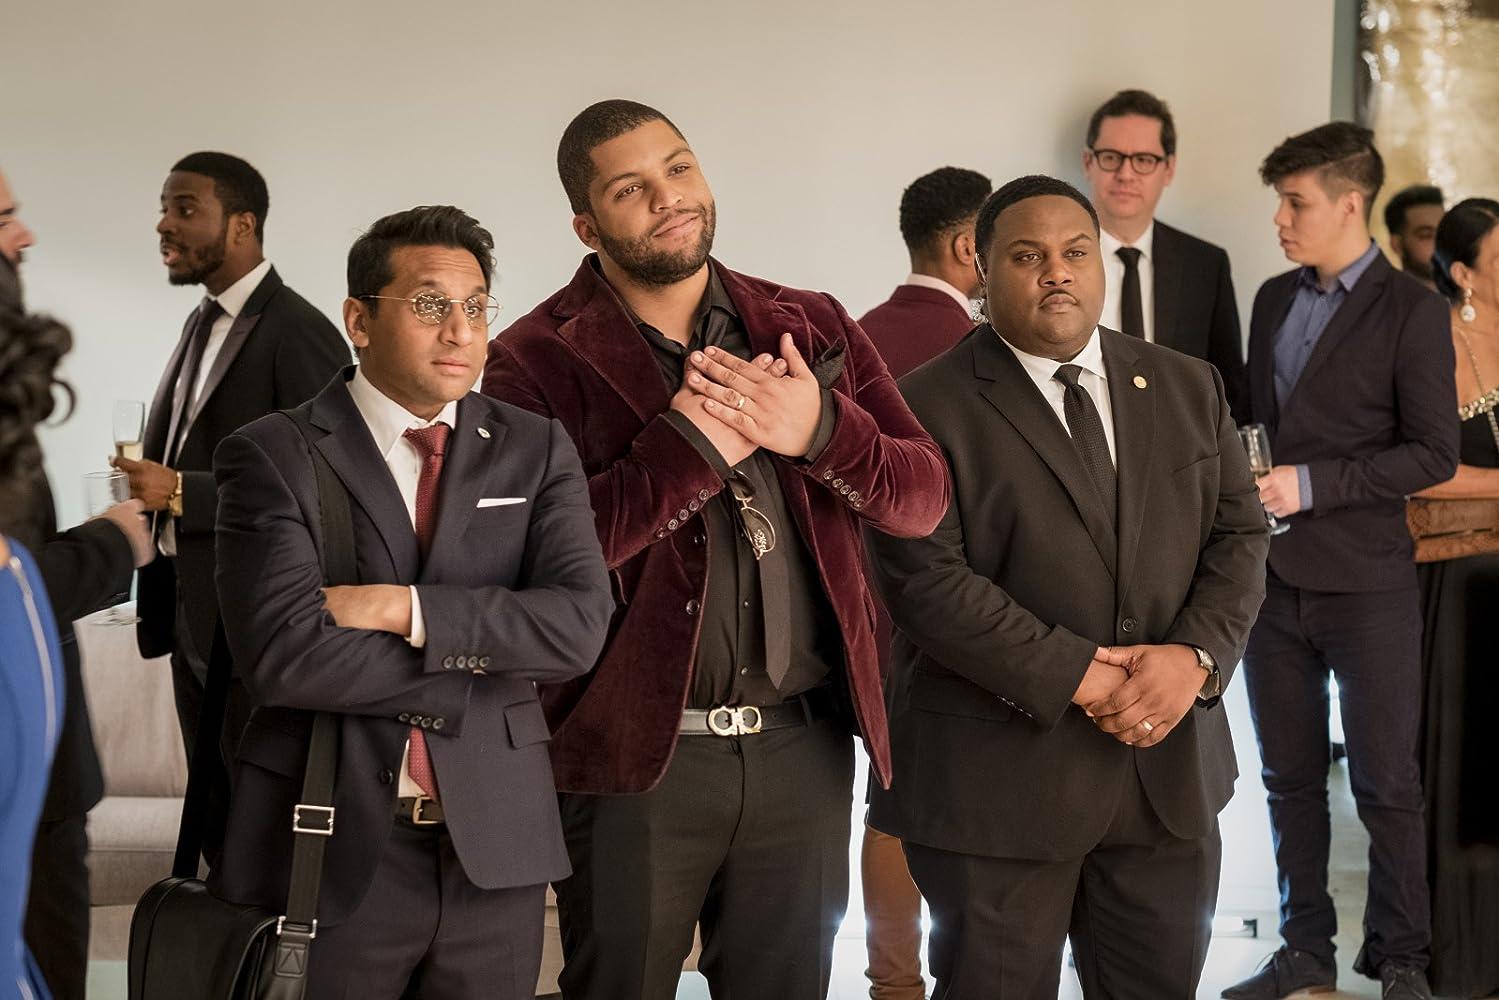 Tristan D. Lalla, Ravi Patel, and O'Shea Jackson Jr. in Long Shot (2019)